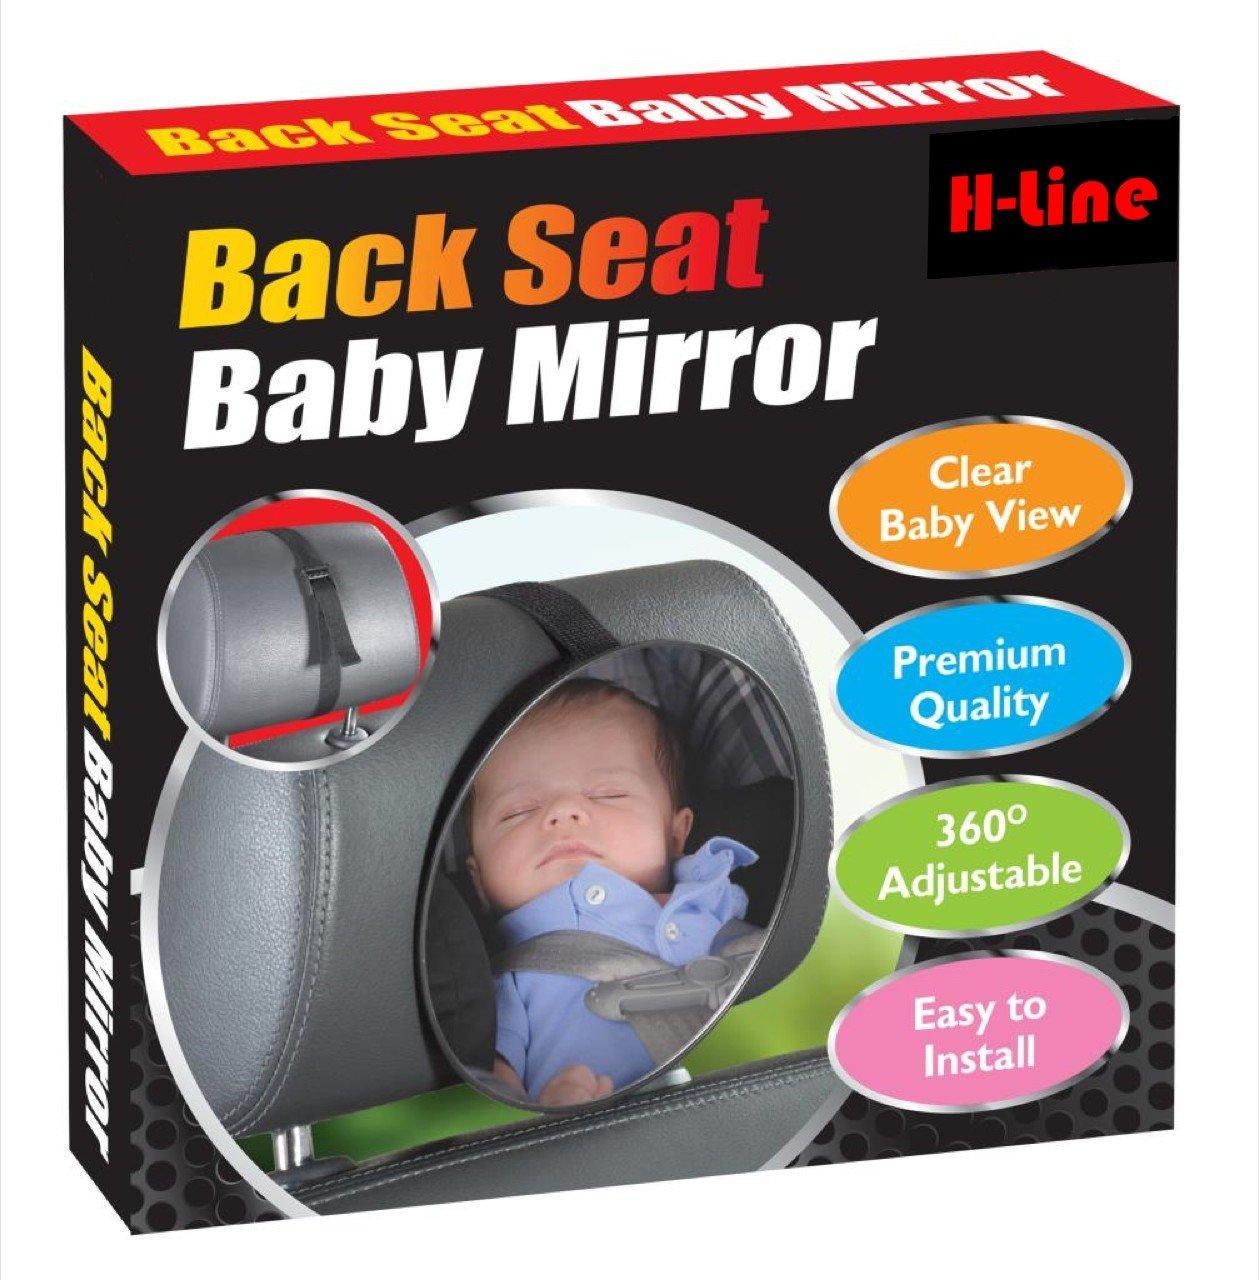 H-LINE ADJUSTABLE ROUND REAR BACK SEAT BABY CHILD CAR SAFETY WIDE VIEW MIRROR HEADREST